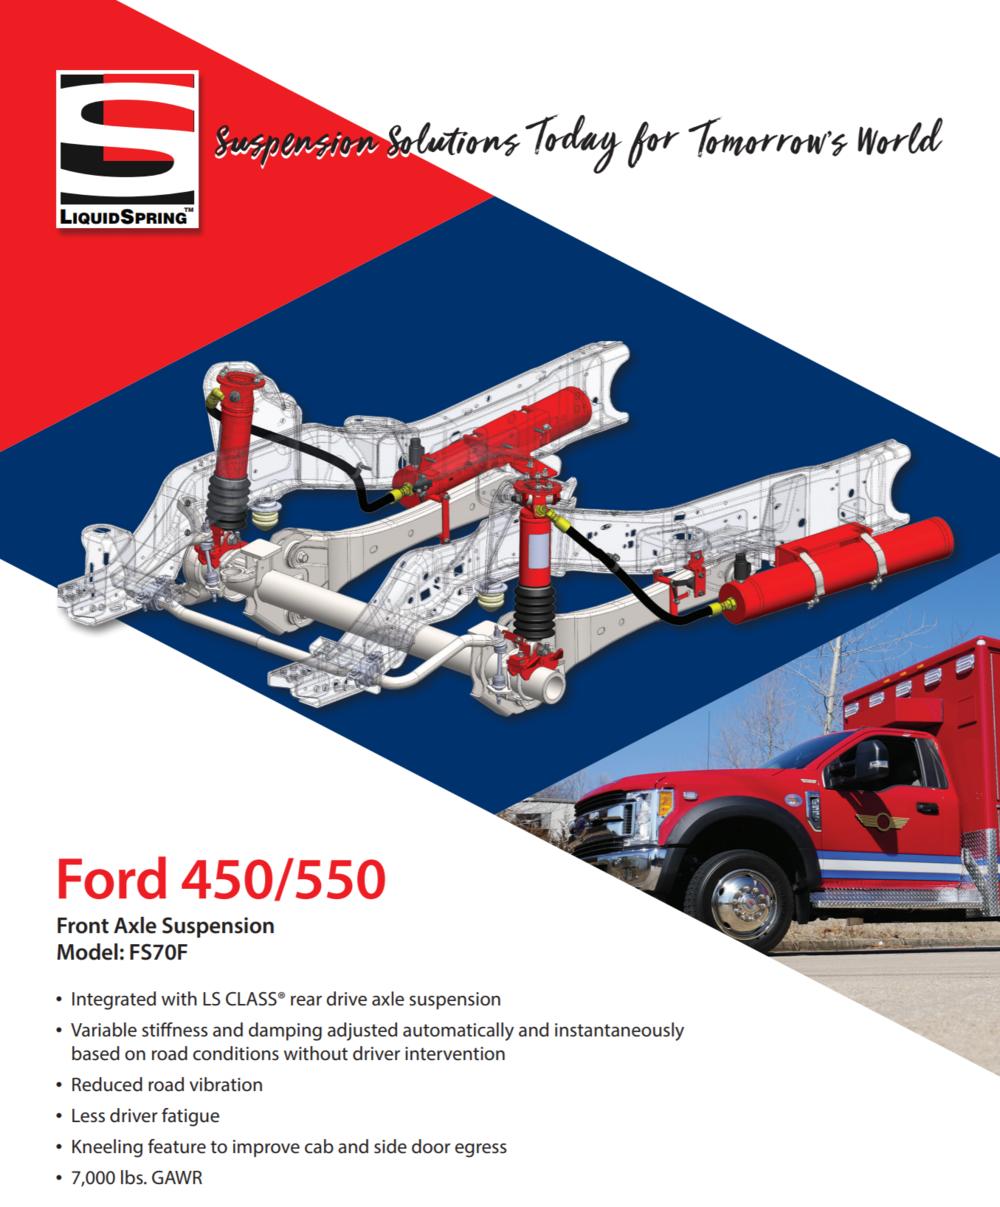 Liquid Spring F450 and F550